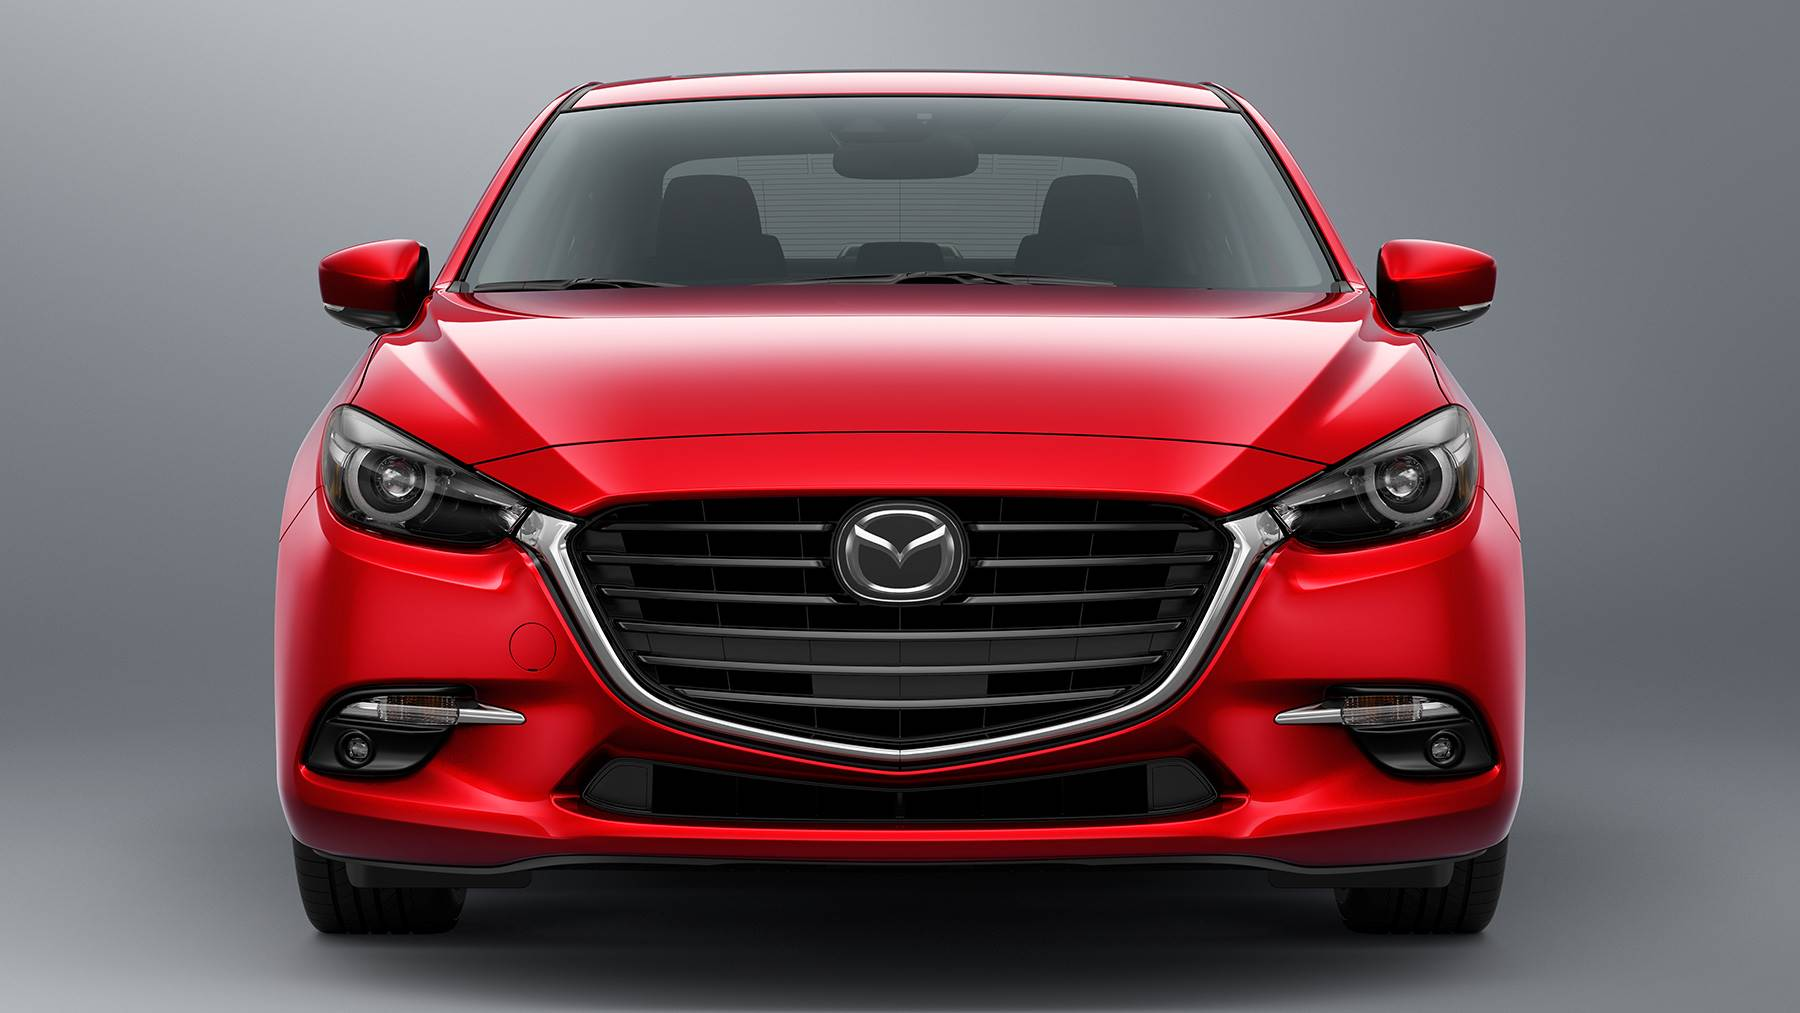 2018 Mazda3 Leasing near Pearland, TX